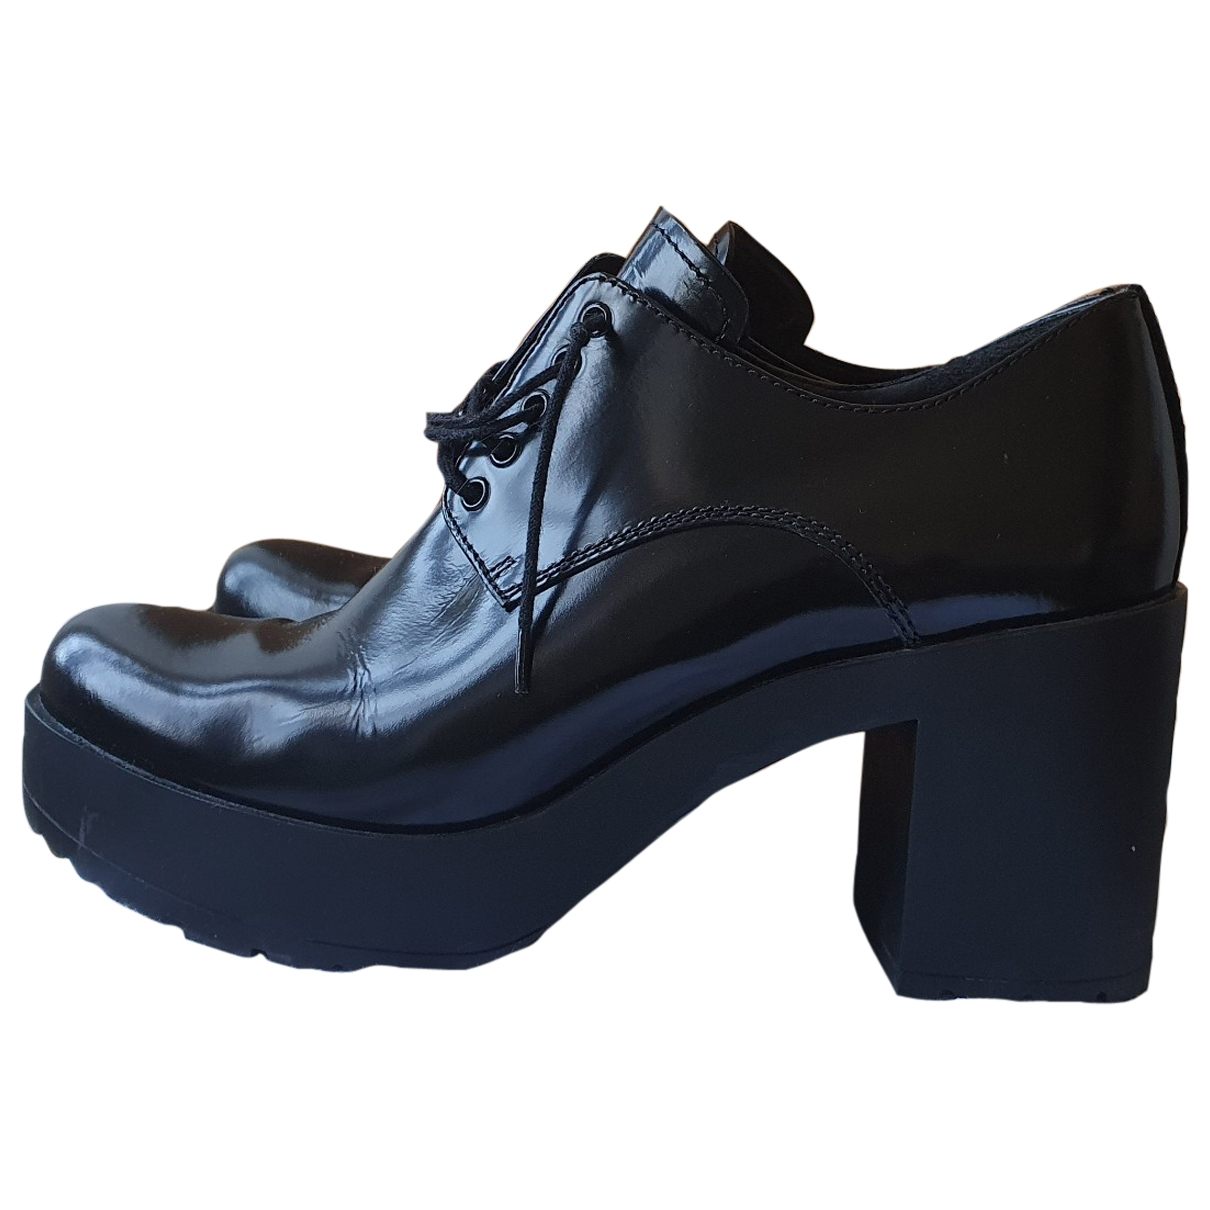 Prada Monolith  Black Leather Lace ups for Women 38 EU